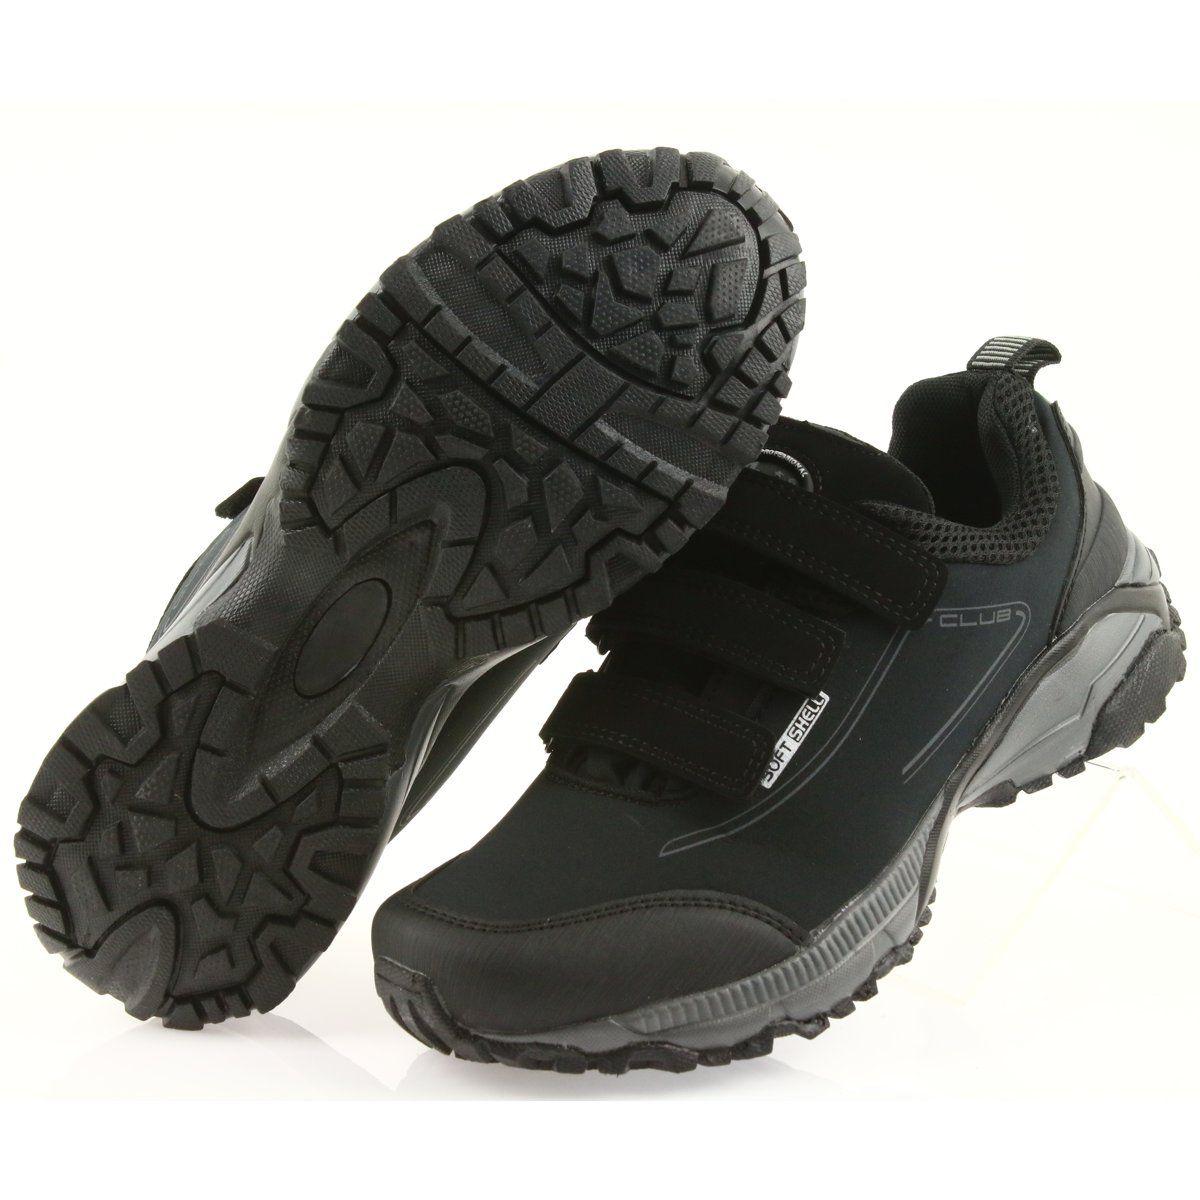 American Club Adi Buty Damskie Sportowe Na Rzepy American Wodoodporne Softhell Wt08 19 Czarne Shoes Fisherman Sandal Sandals